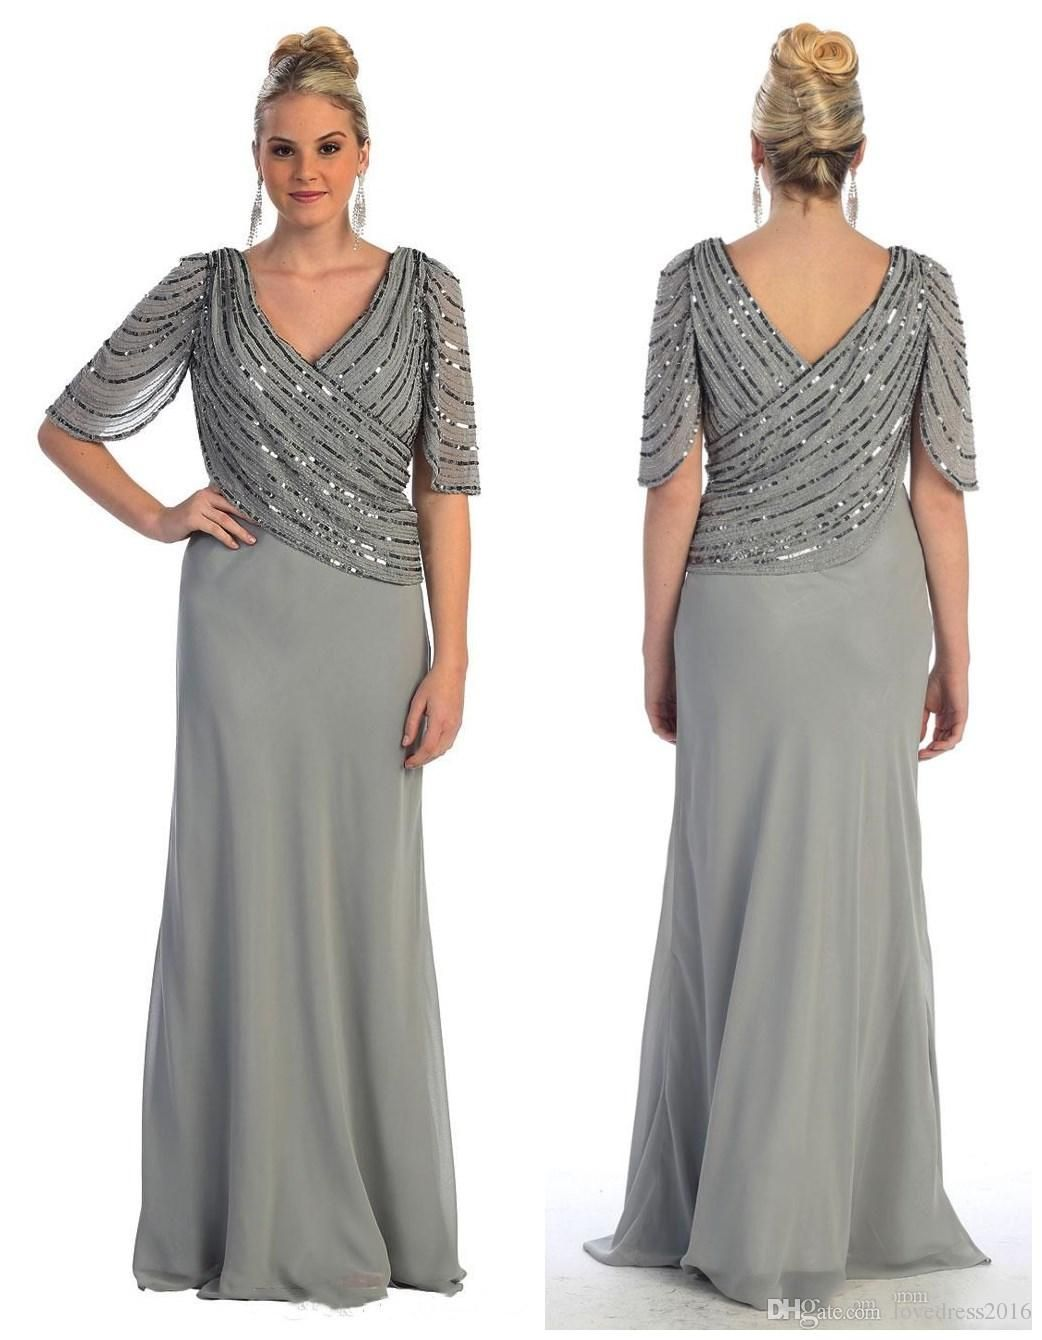 2018 Plus Size Mother Of The Bride Dresses V Neck Sequins Half Sleeves Evening P Plus Size Wedding Gowns Wedding Guest Dresses Long Mother Of The Bride Dresses